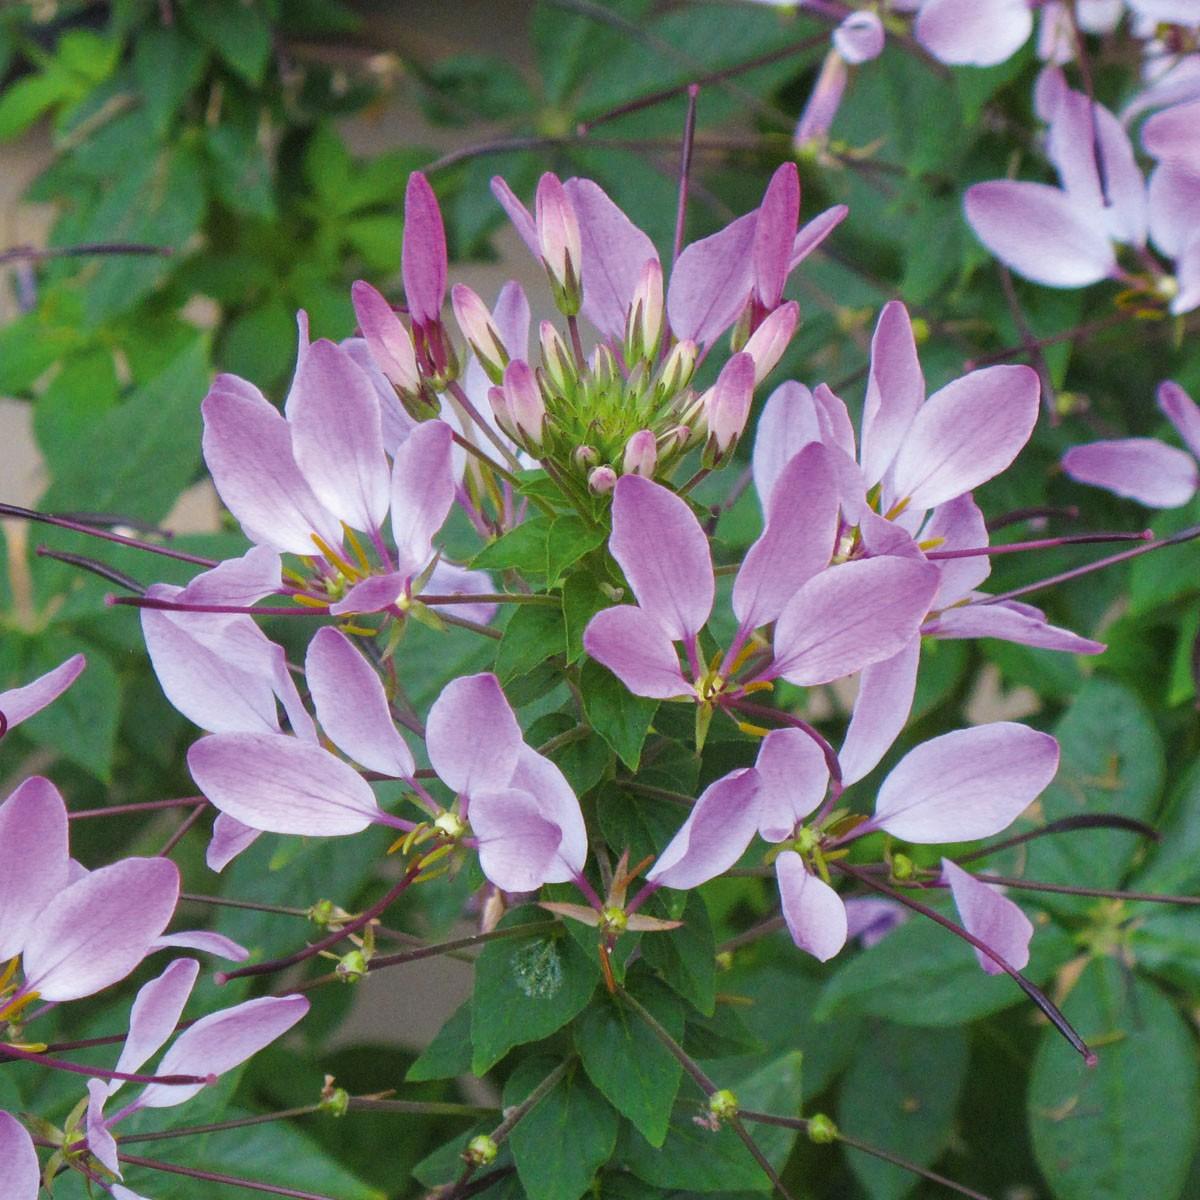 Spinnenpflanze (Cleome) 'Kelly Rose'